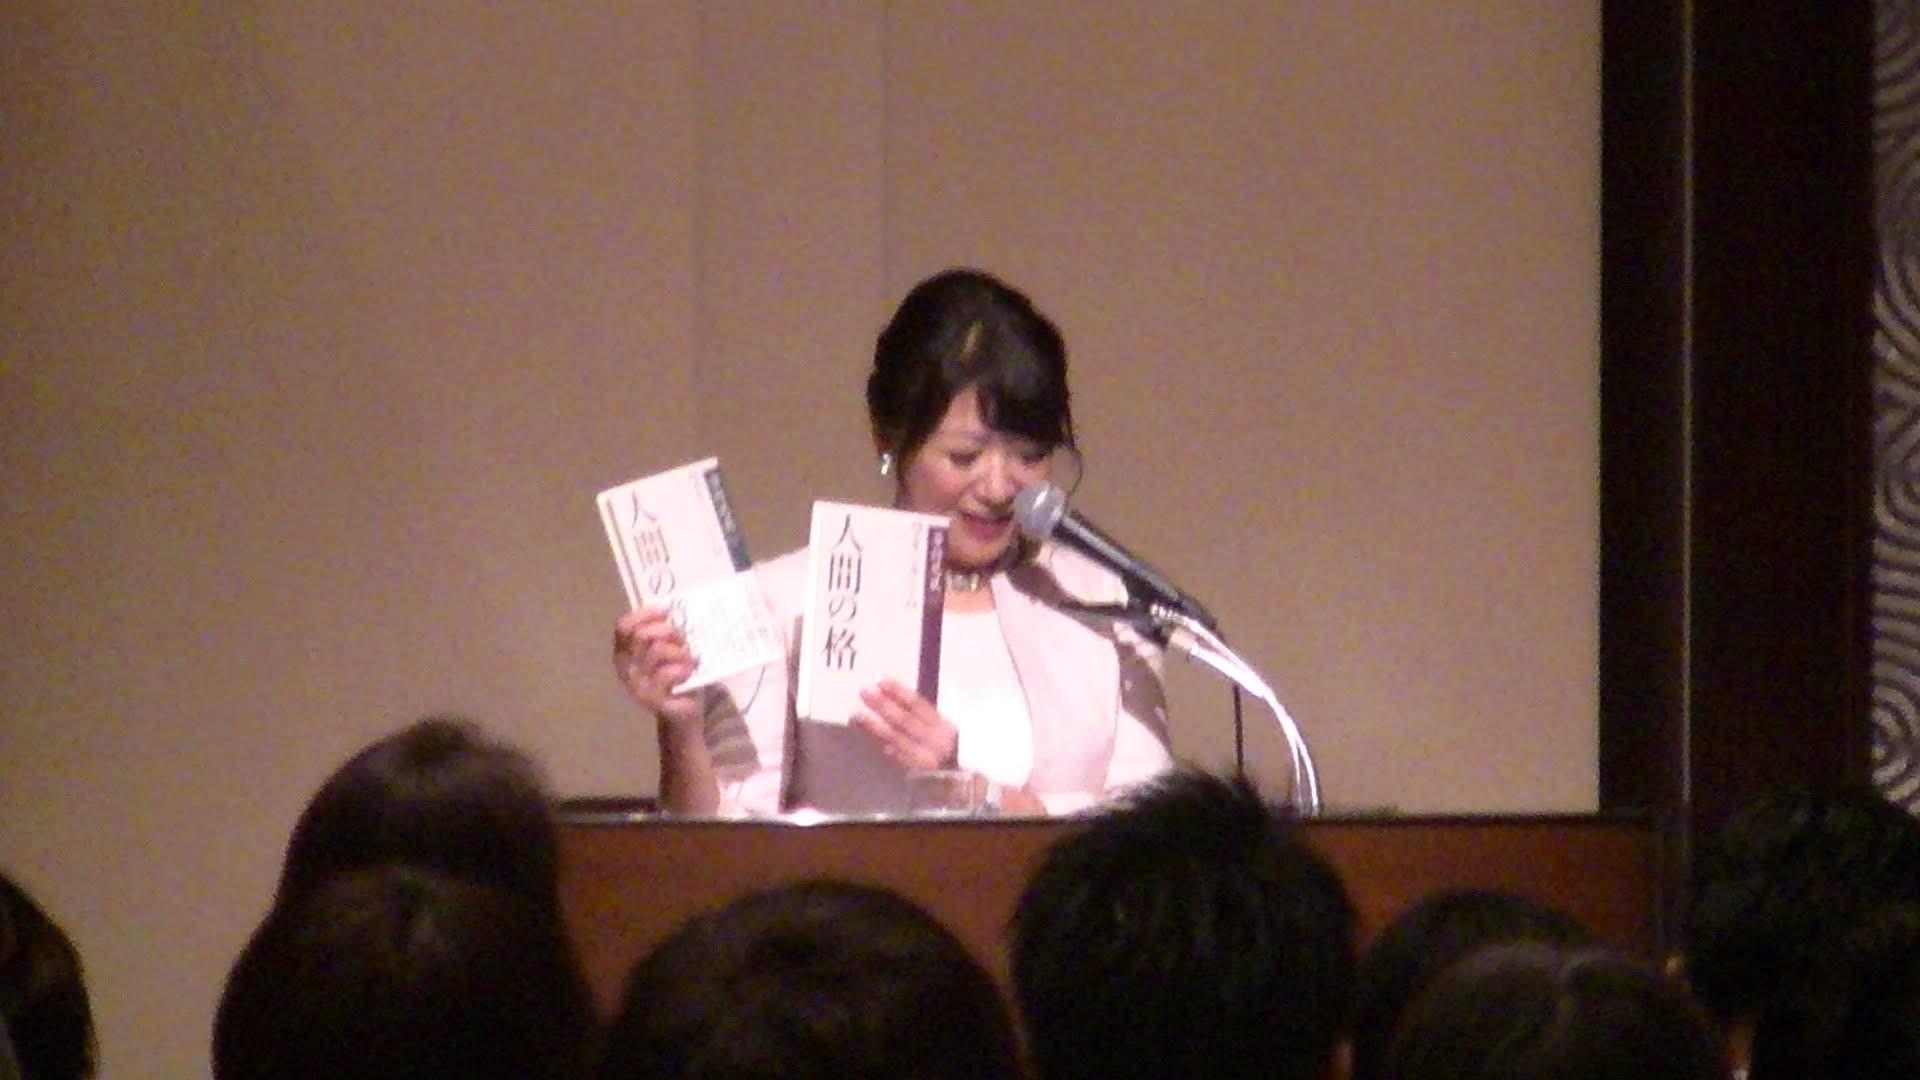 PIC 1627 1 - 思風会全国大会in広島